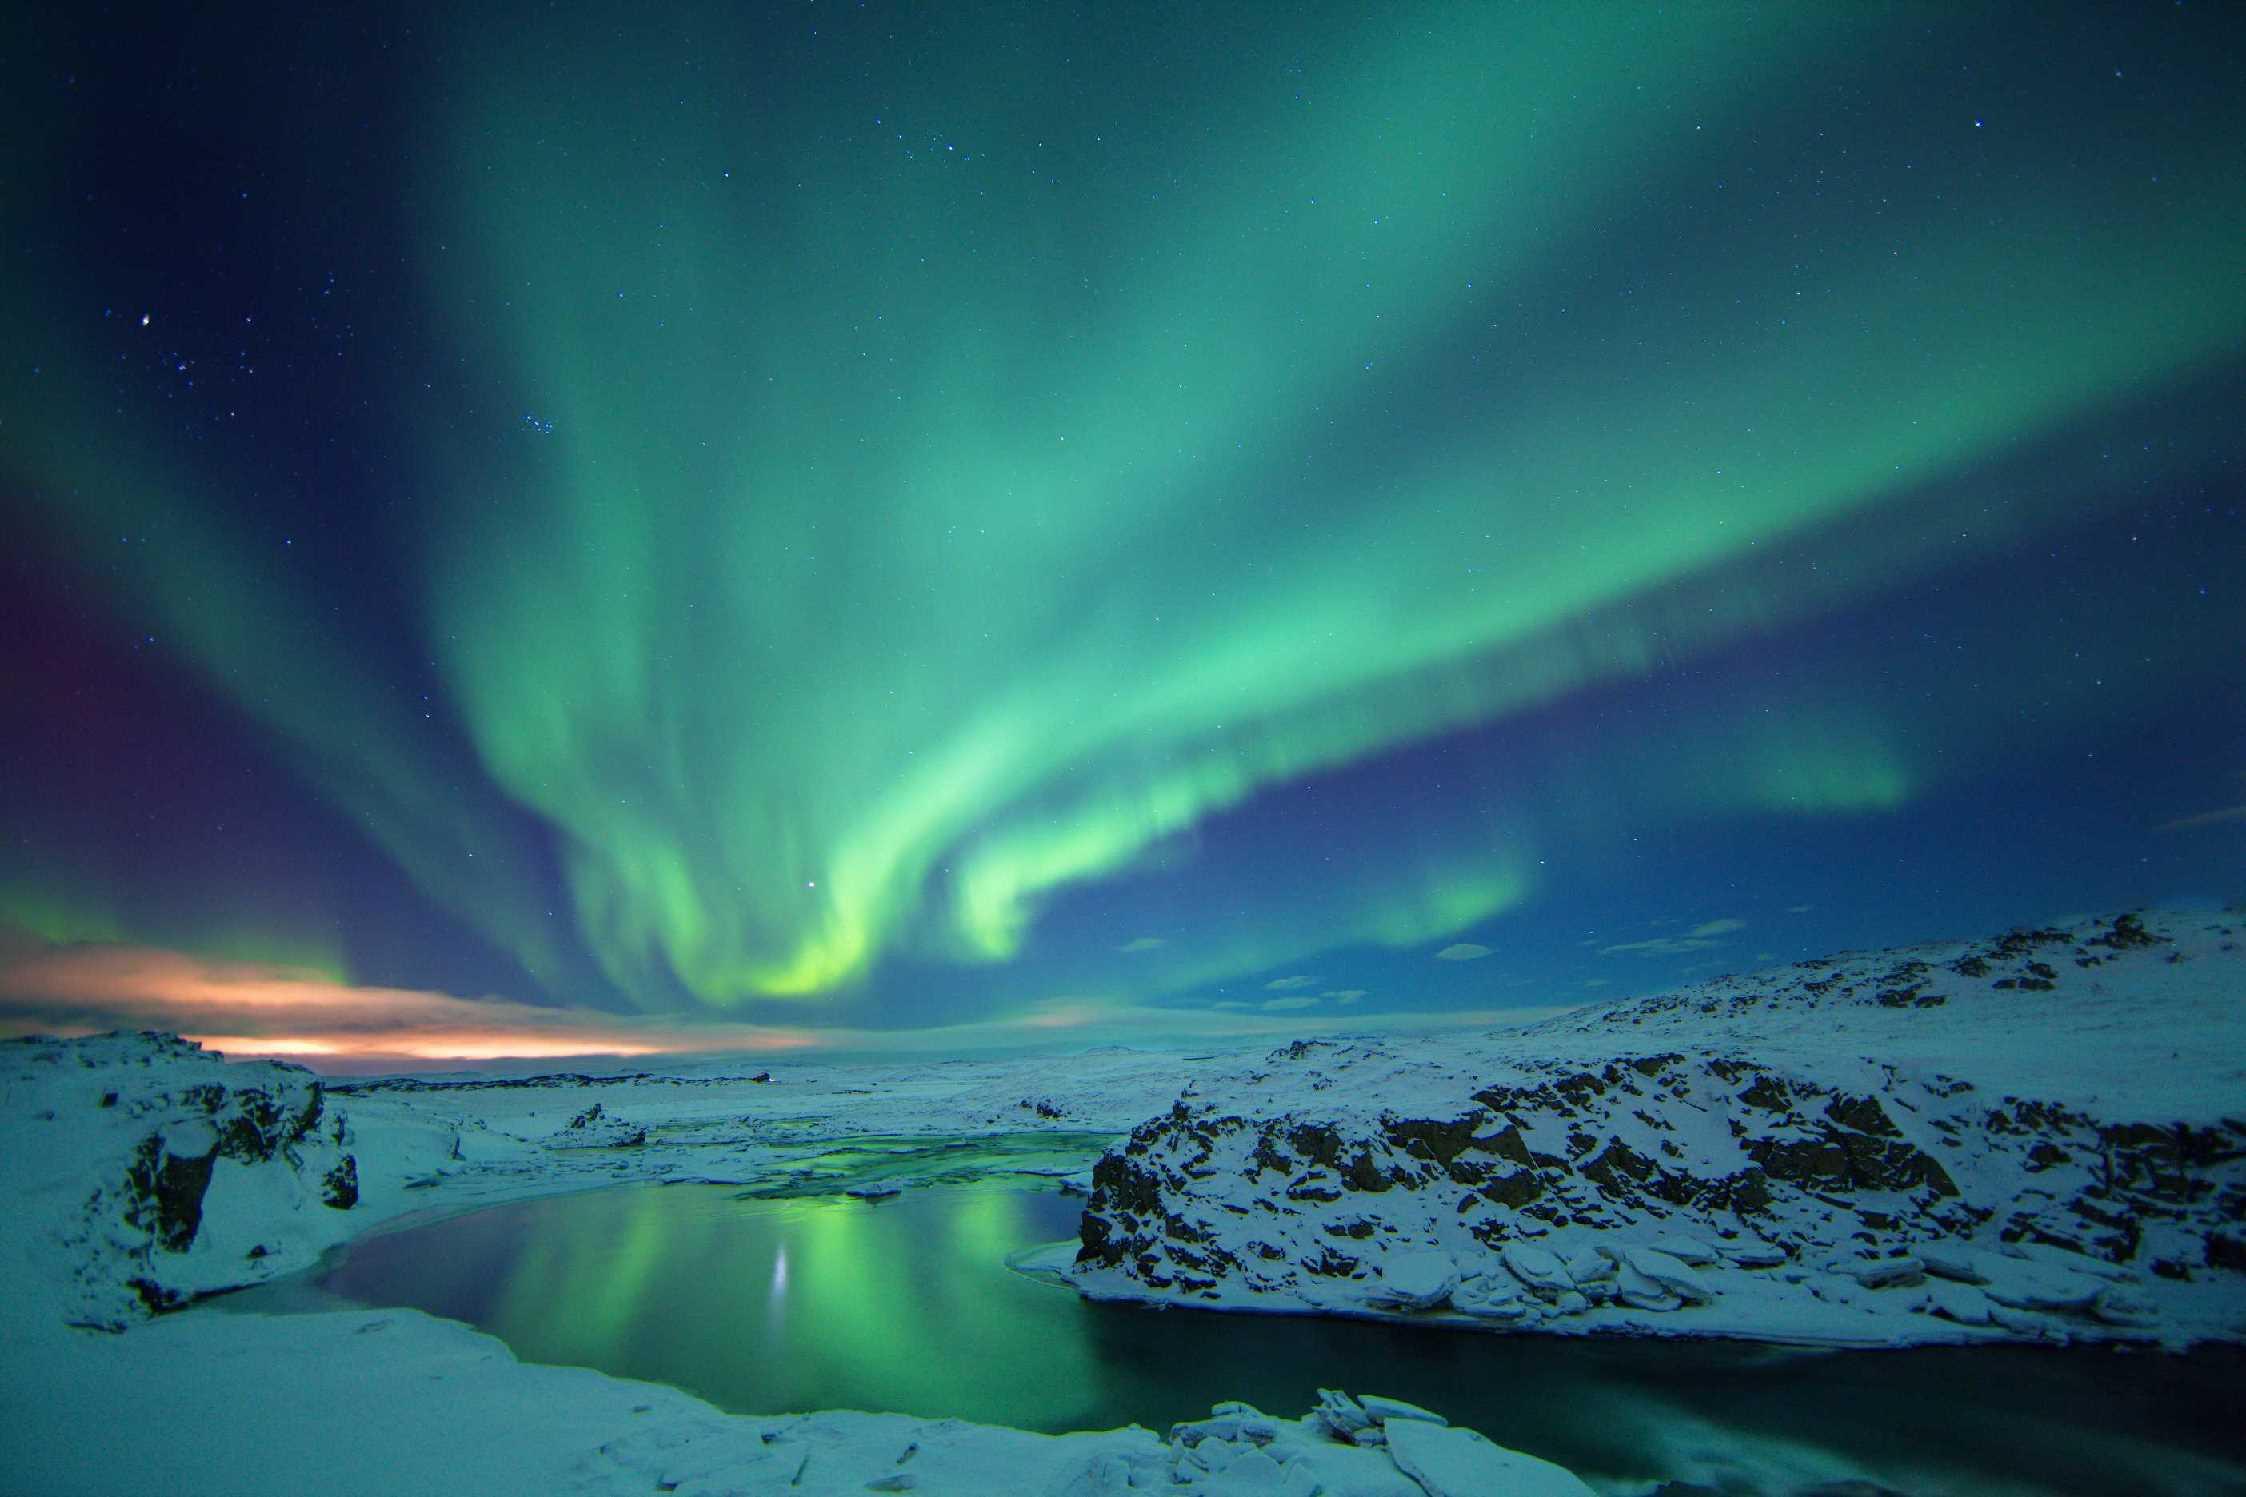 SRE64_003 icelandic times